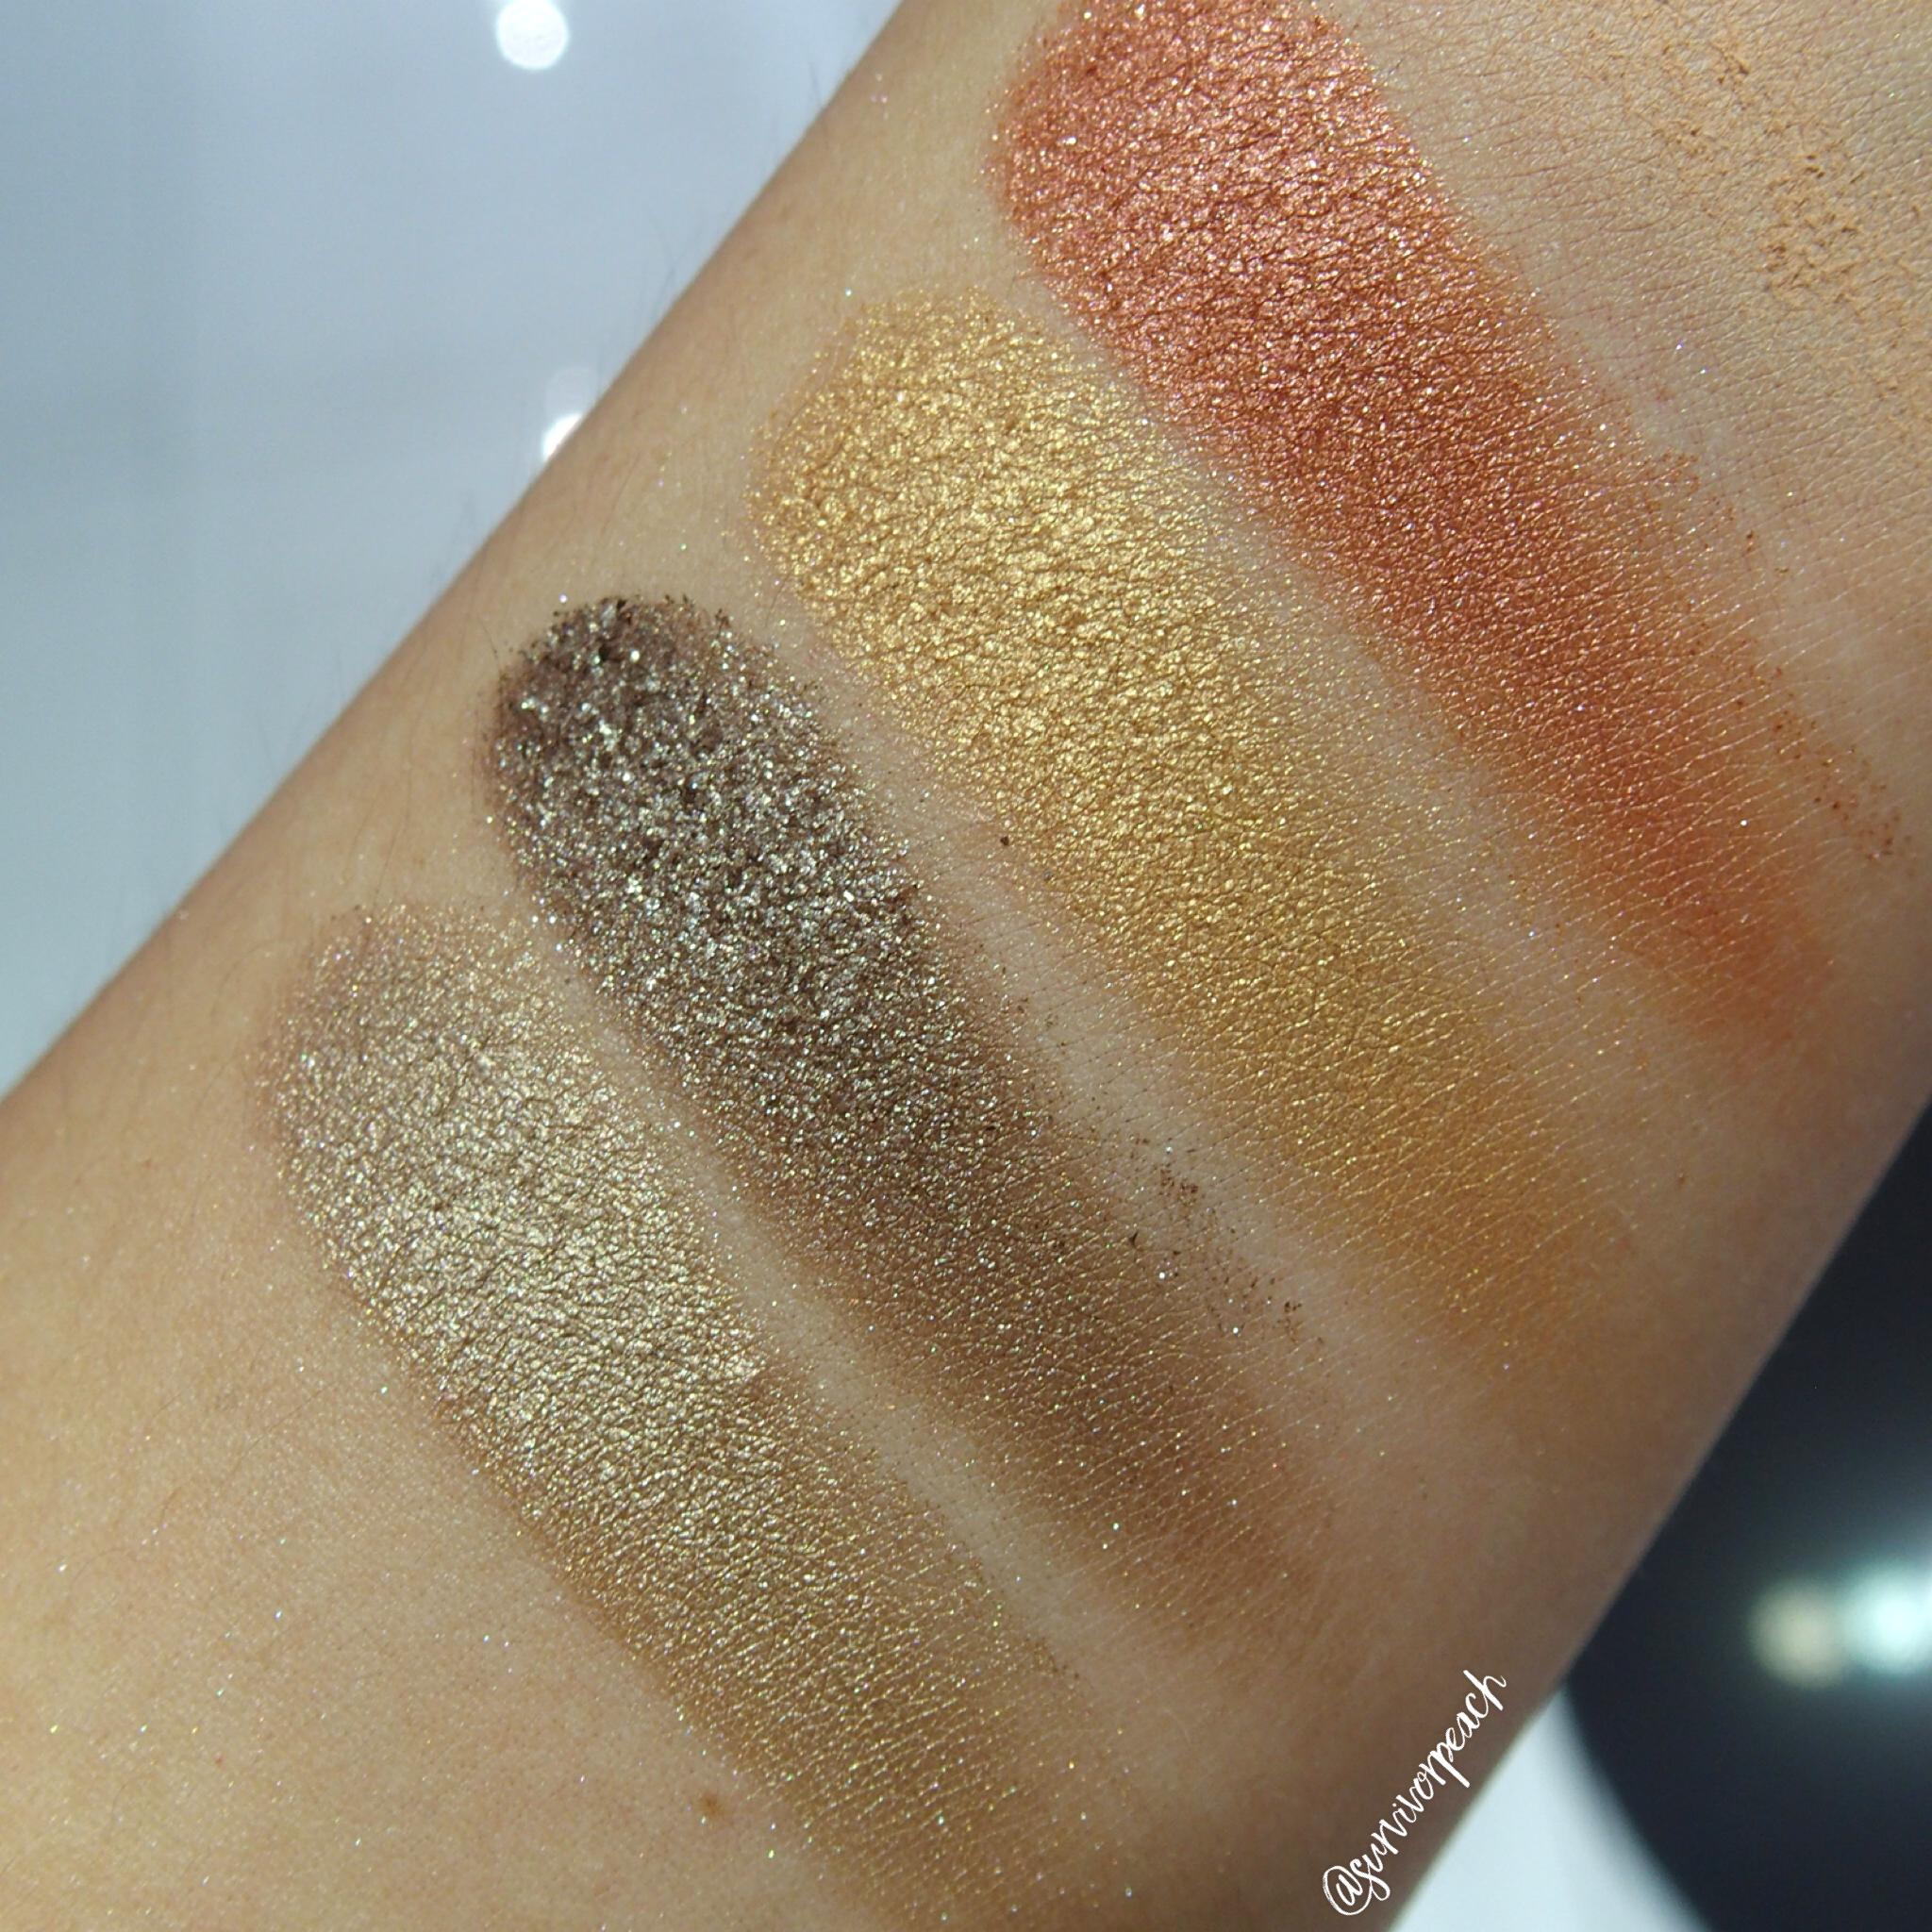 Sephora Collection Flash Sequins Eyeshadow Palette 01 Peach Gold swatches